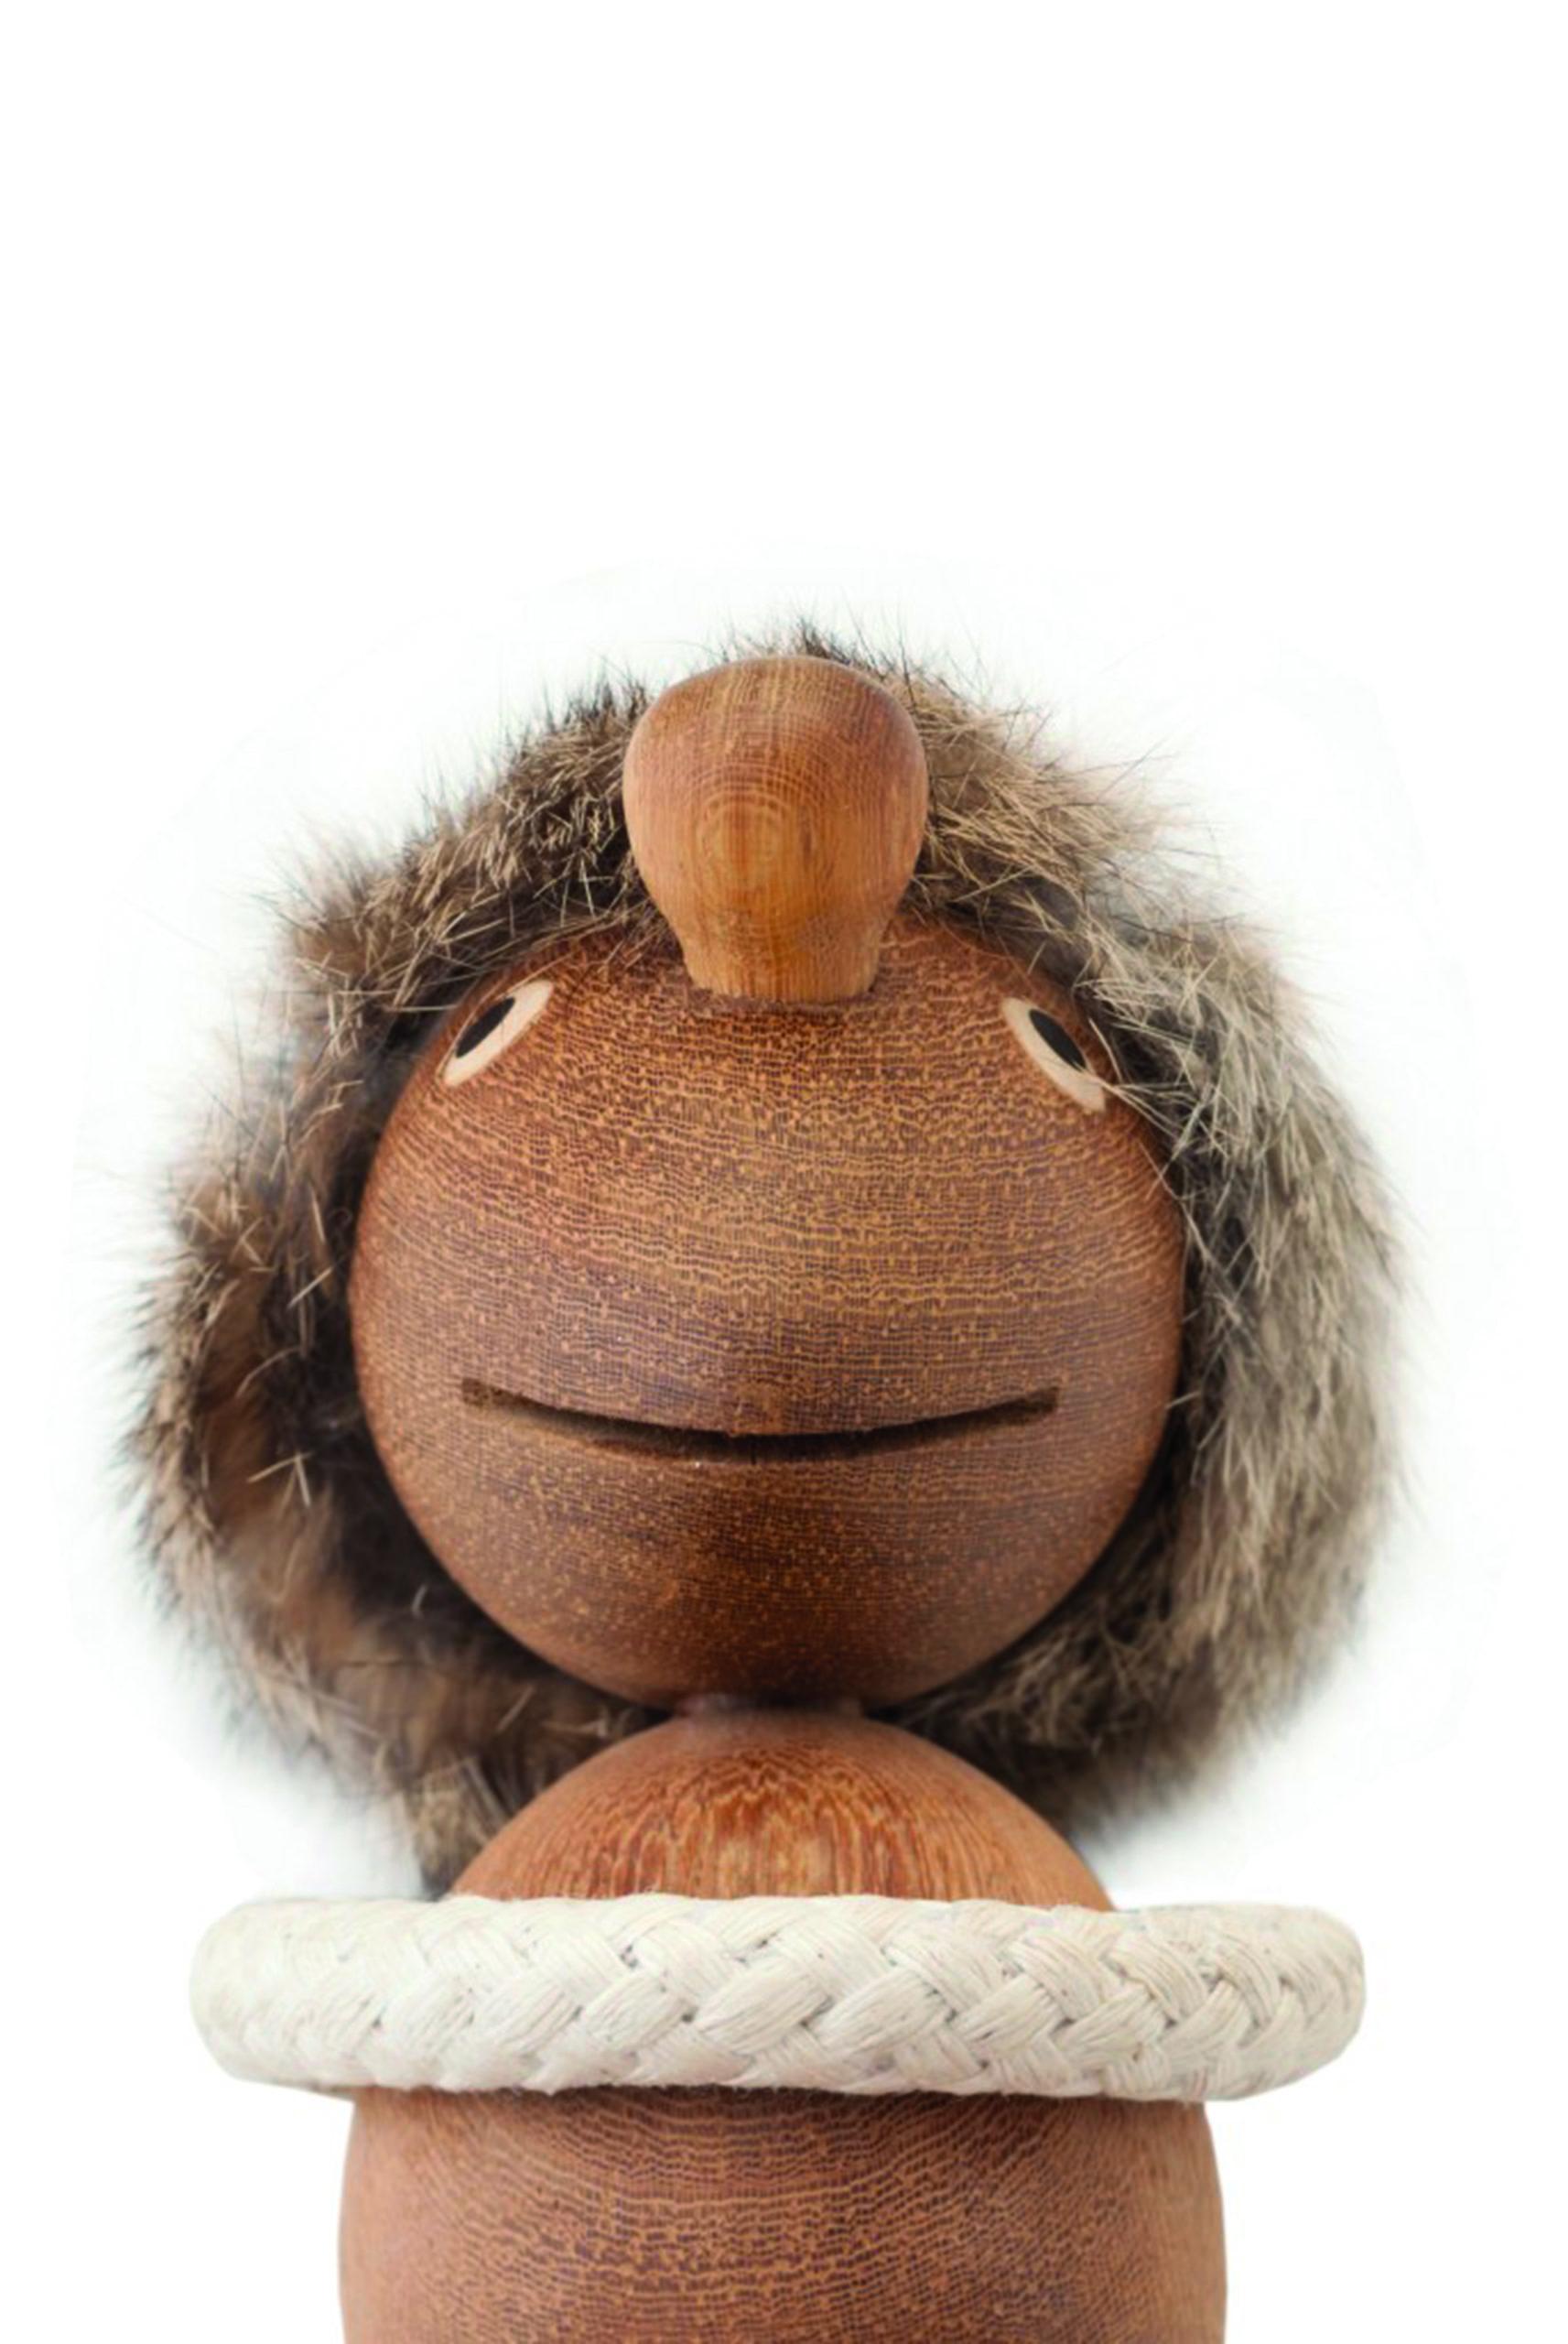 ARCHITECTMADE Optimist Teak Wood Object Hans Bølling